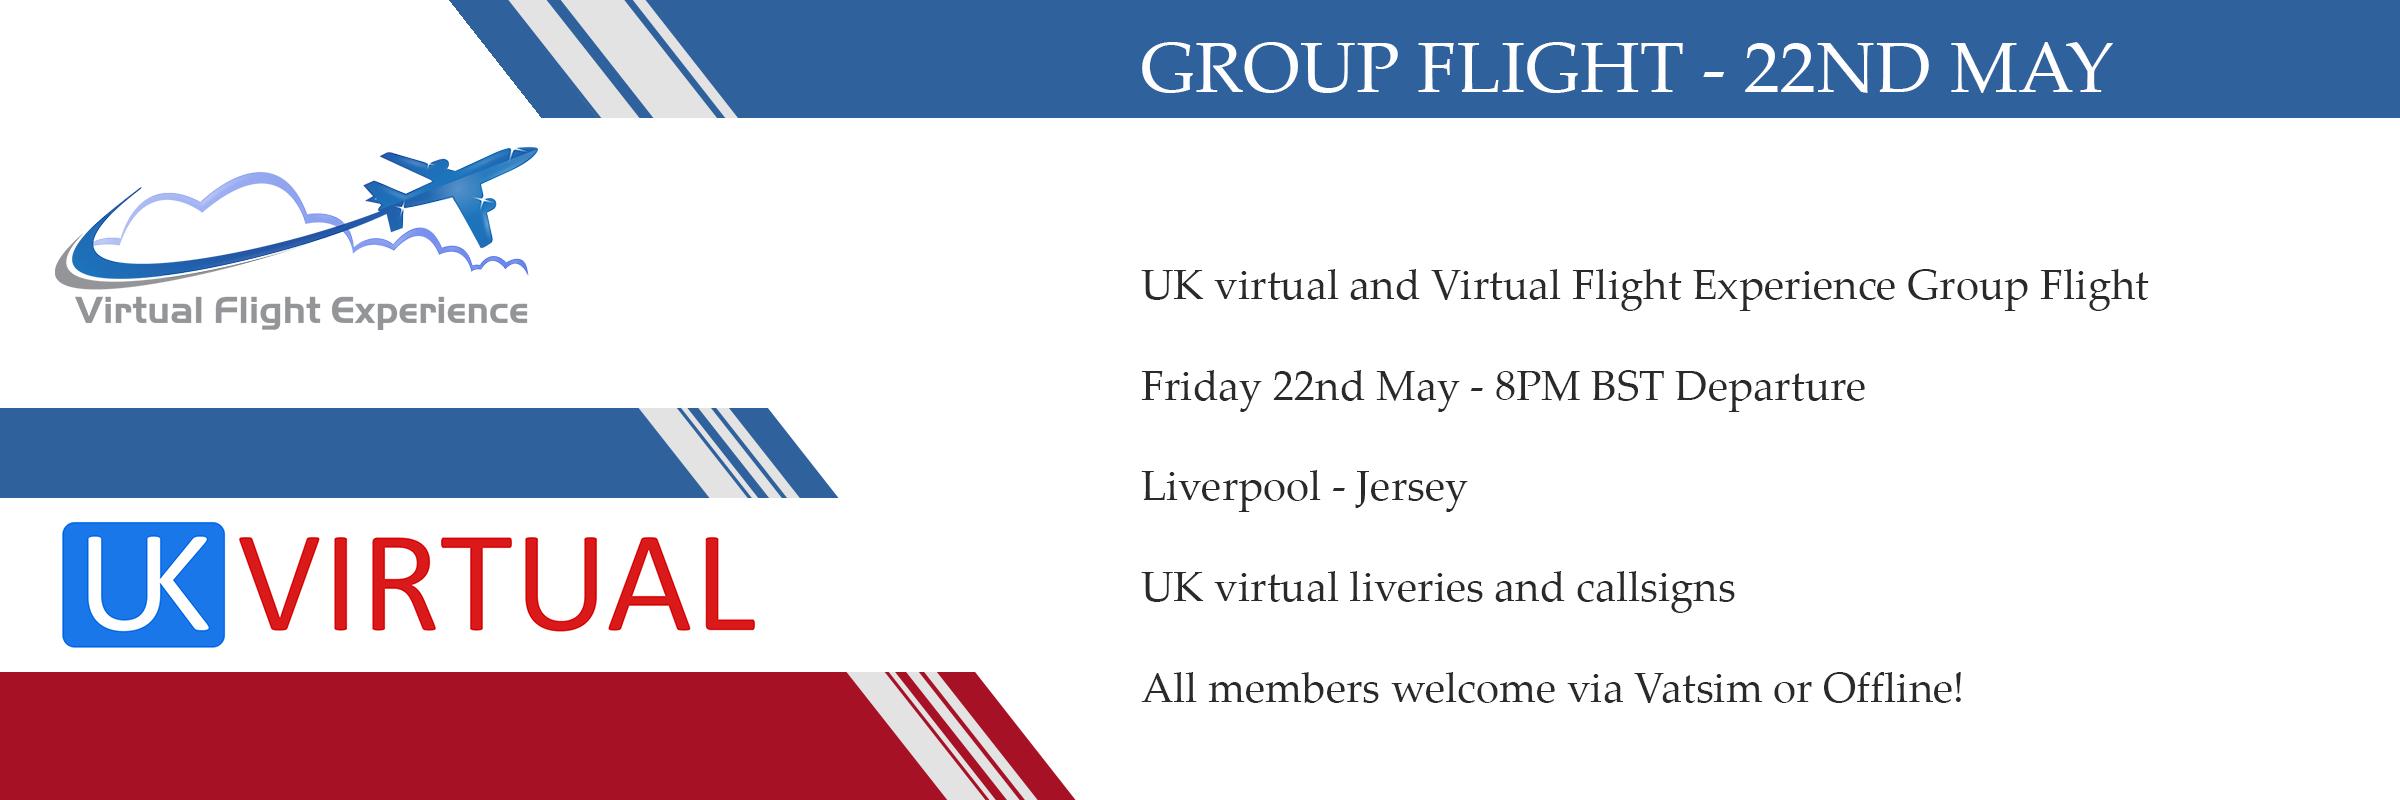 UK virtual / VFE Group Flight